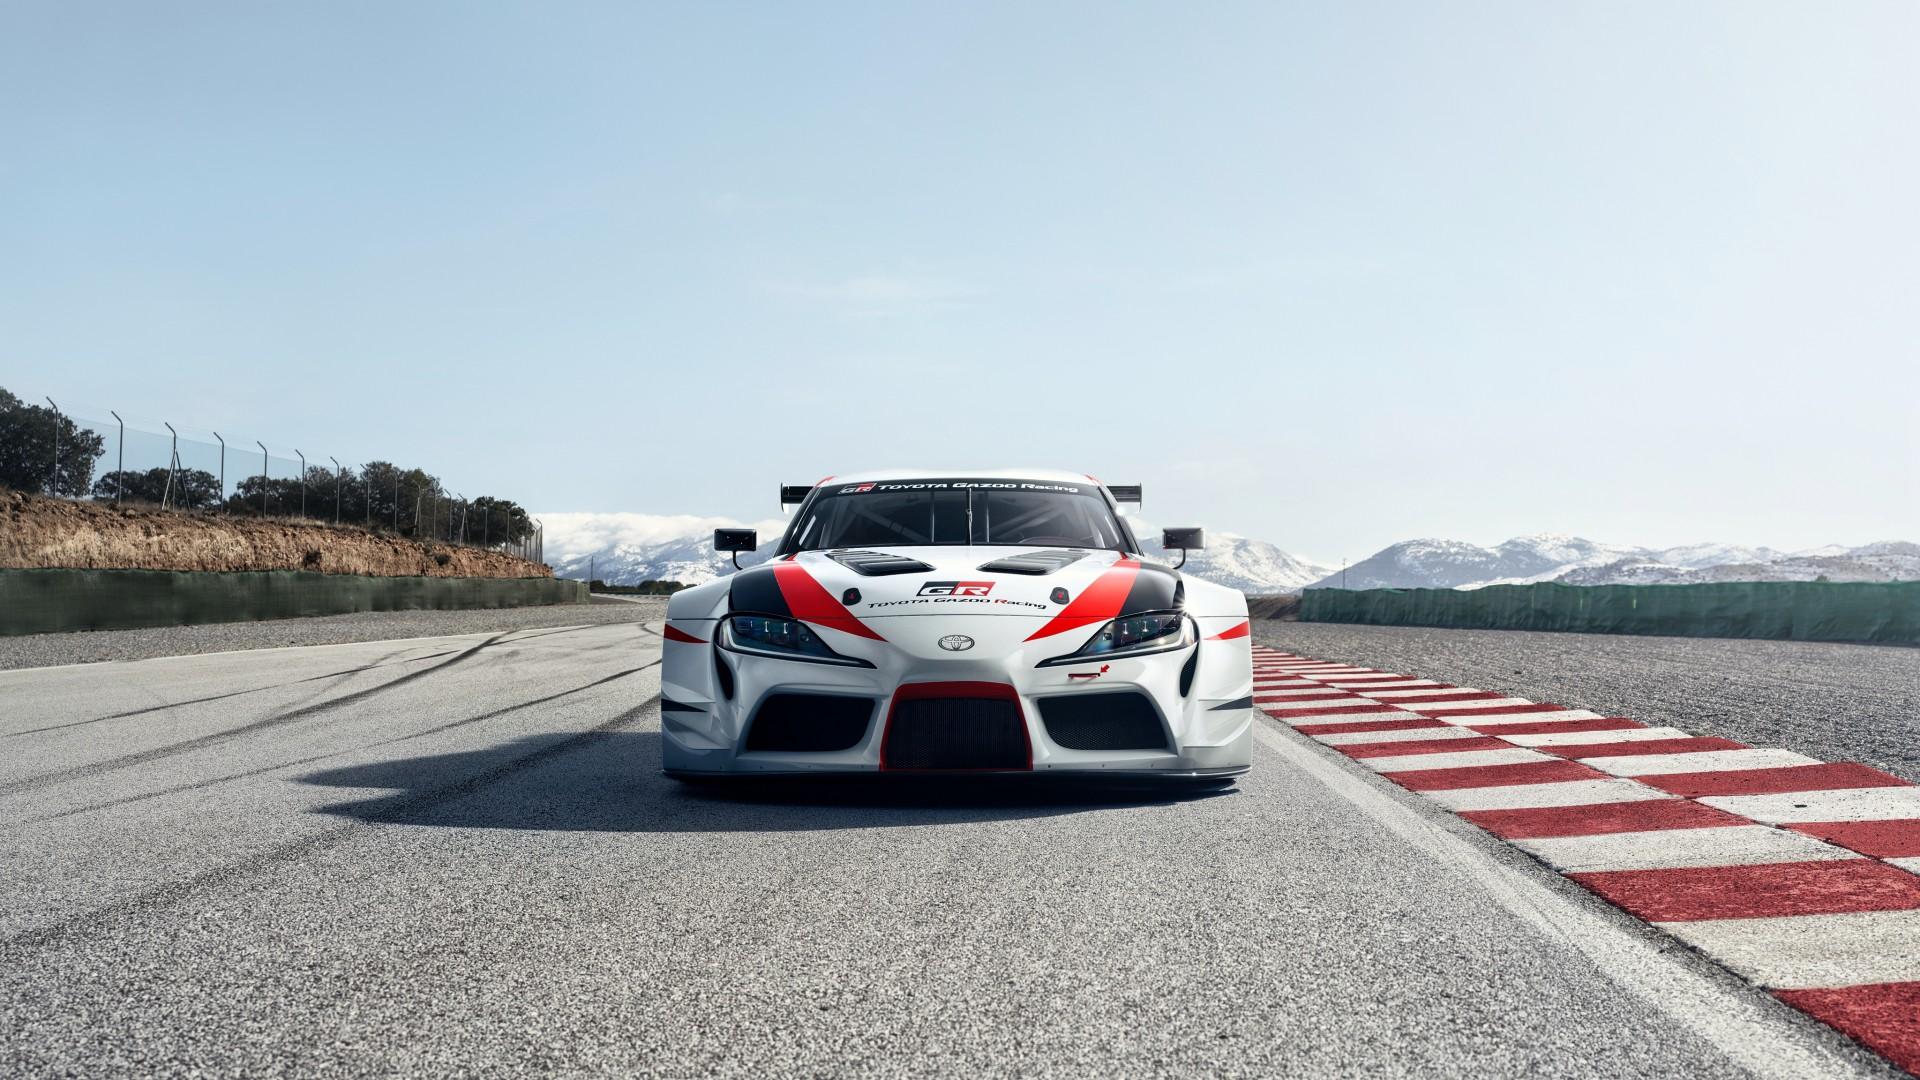 2018 Toyota GR Supra Racing Concept 4K 8 Wallpaper